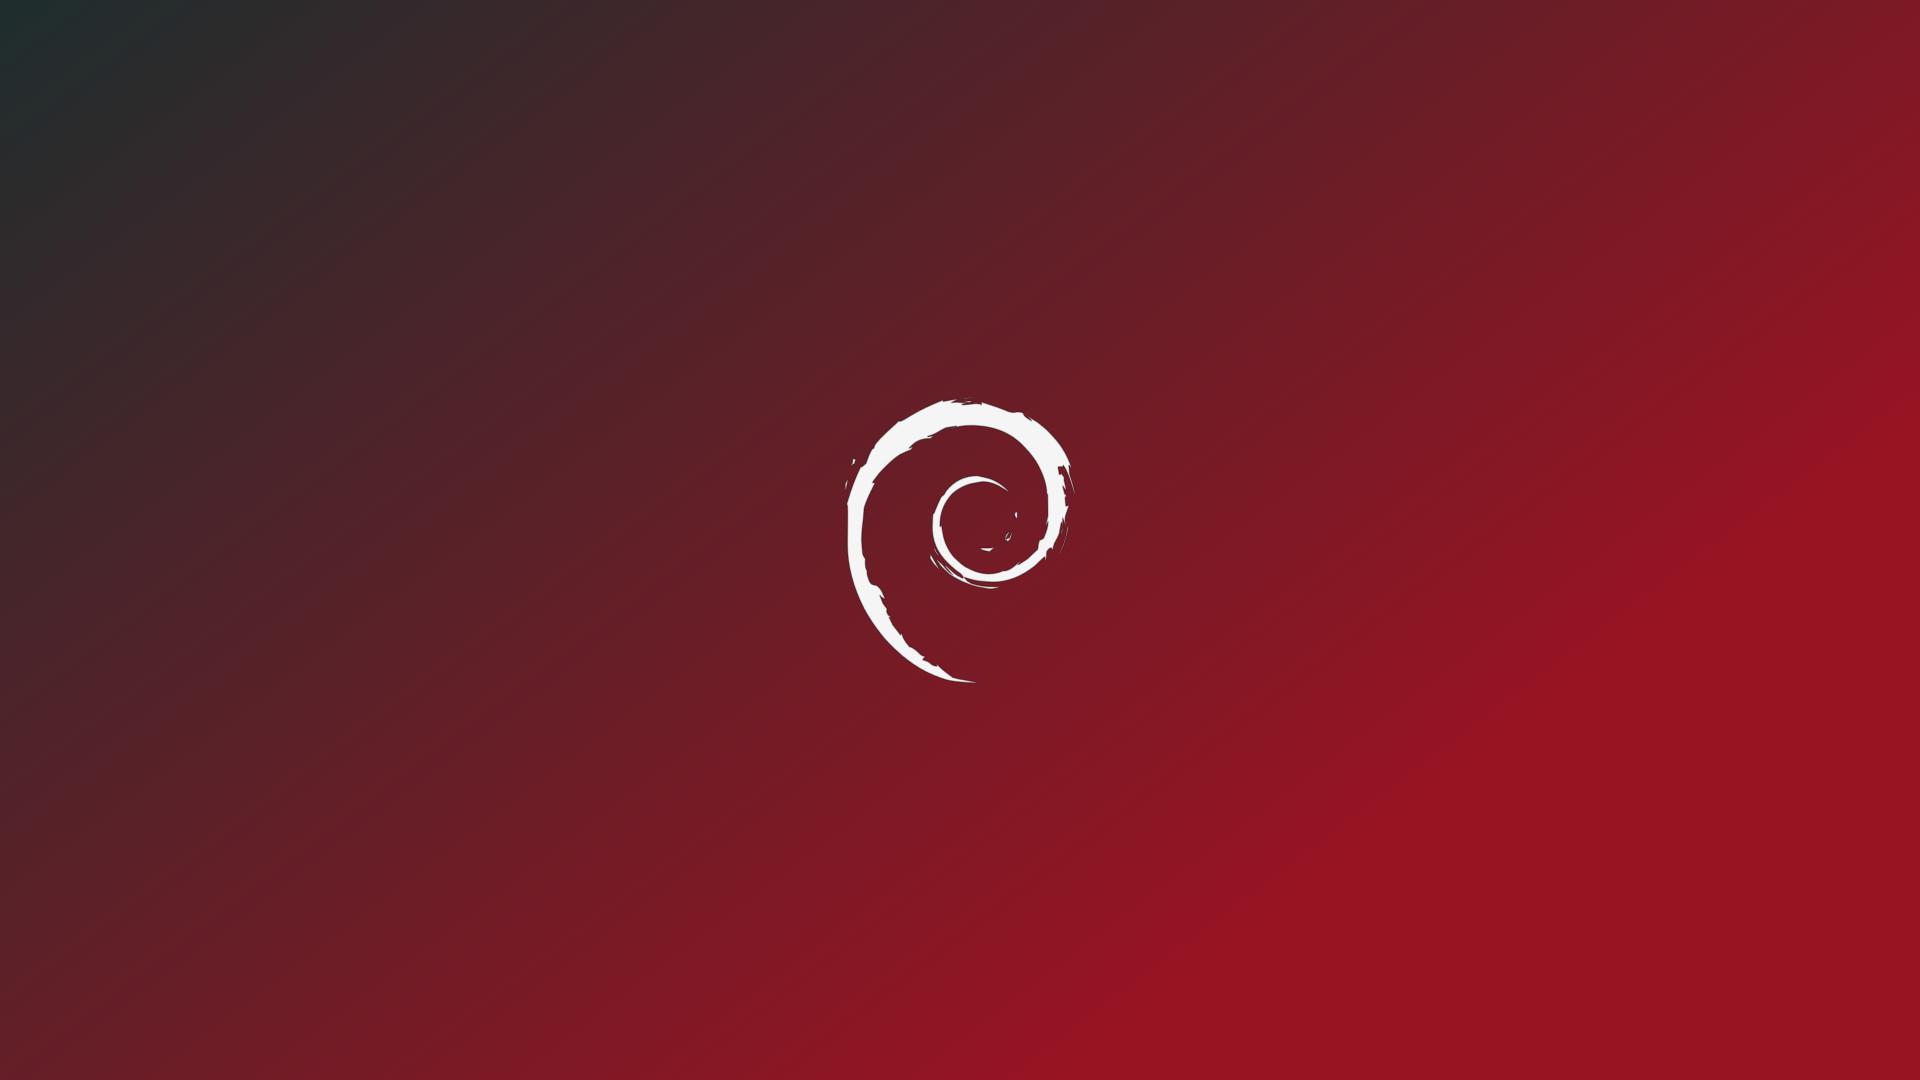 Debian Wallpaper (77+ images)